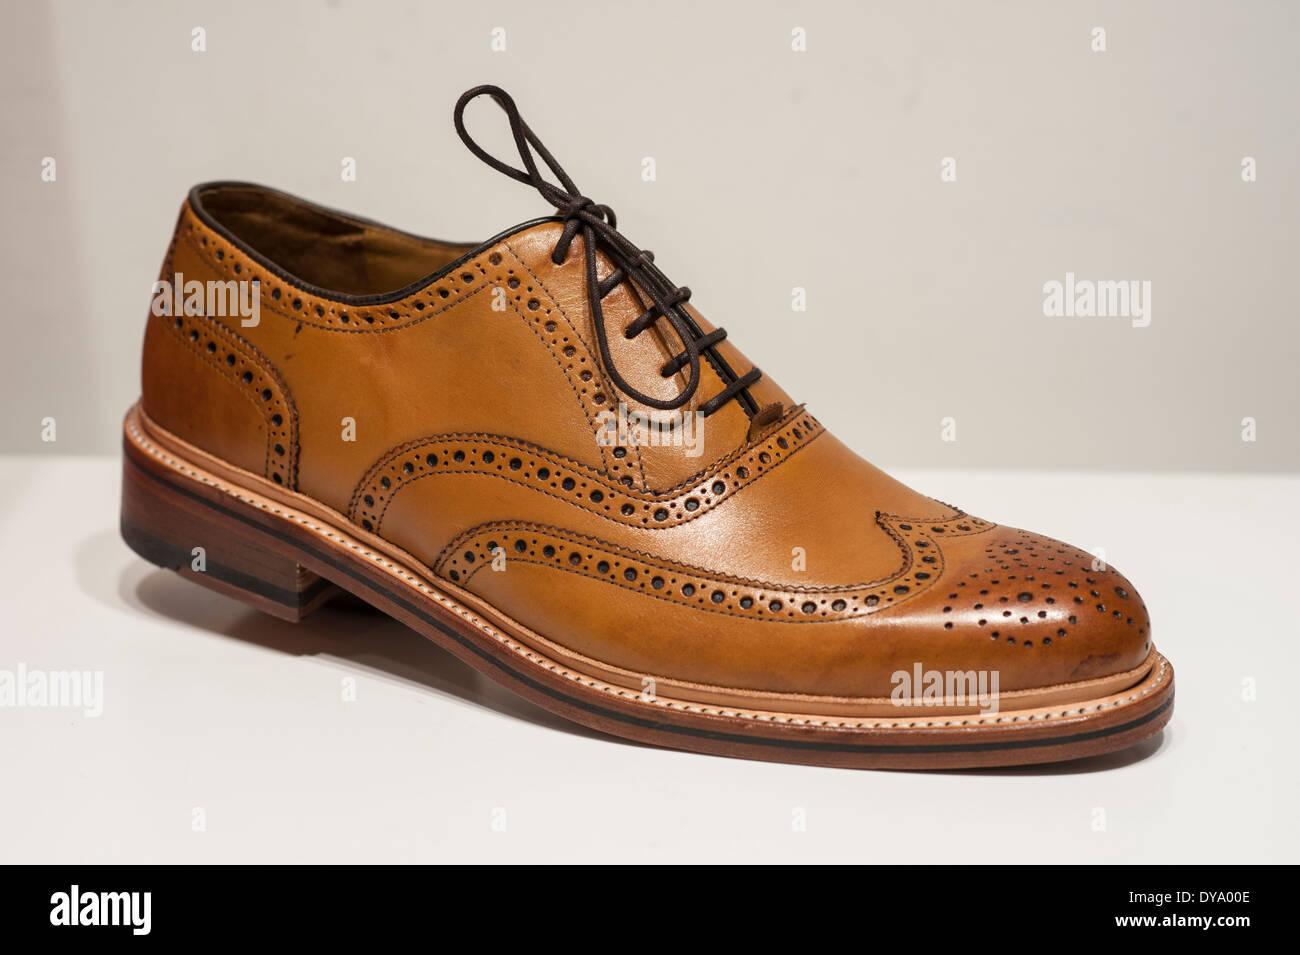 Schuh Herrenschuh Budapester Art Shoe Men Shoe Budapester Stock